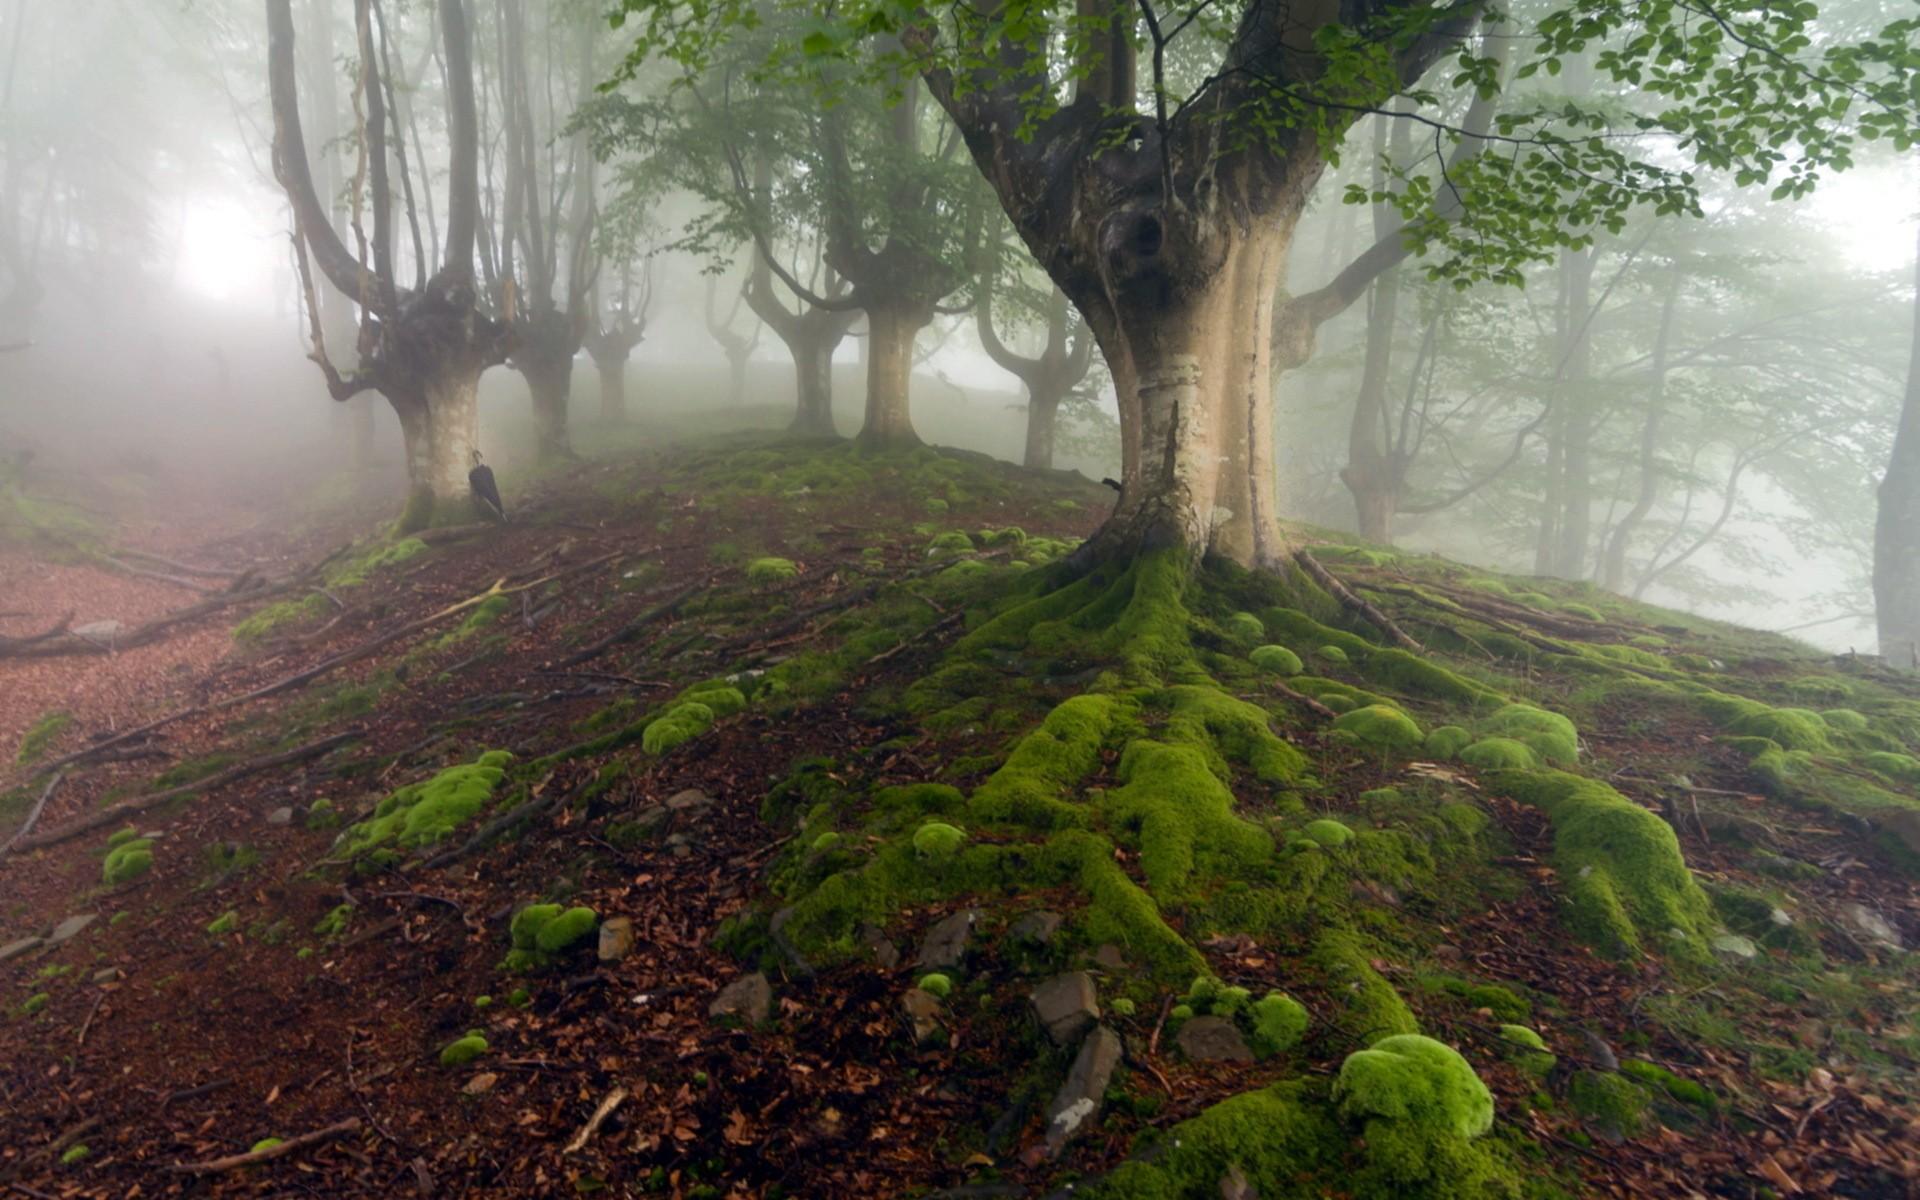 landscapes trees fog - photo #16